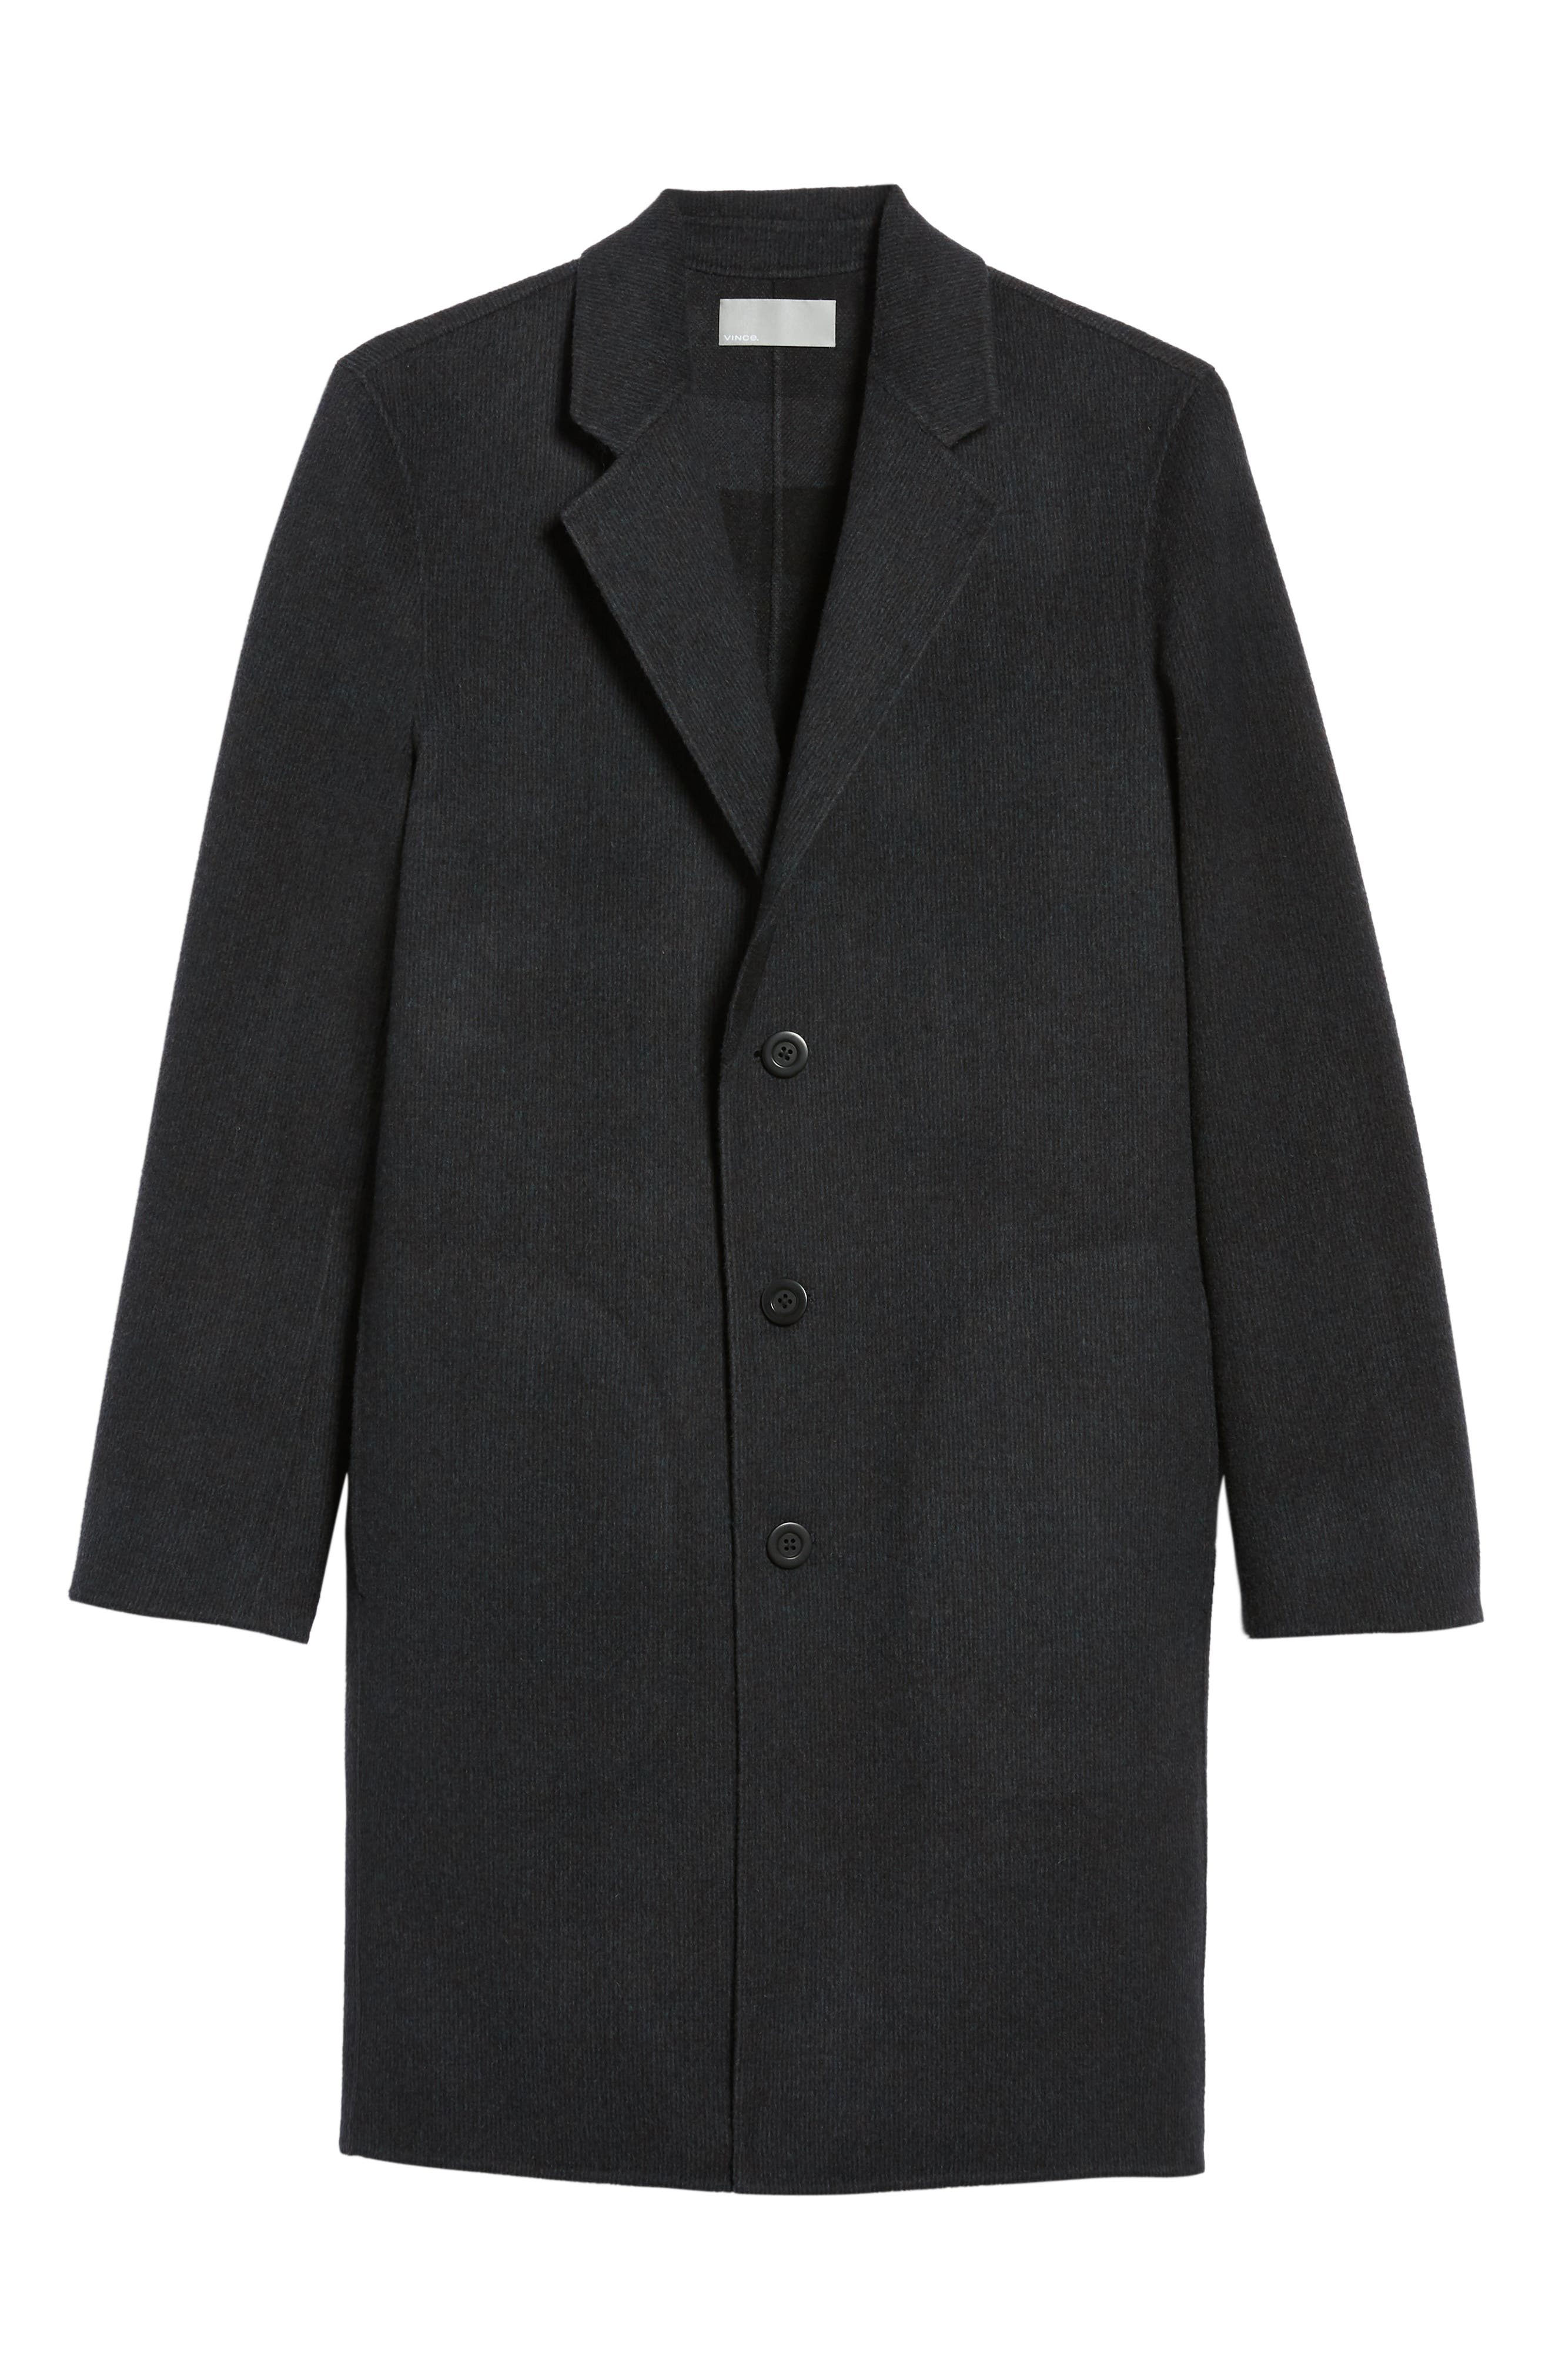 Wool Blend Car Coat,                             Alternate thumbnail 5, color,                             BLACK/ H CHARCOAL